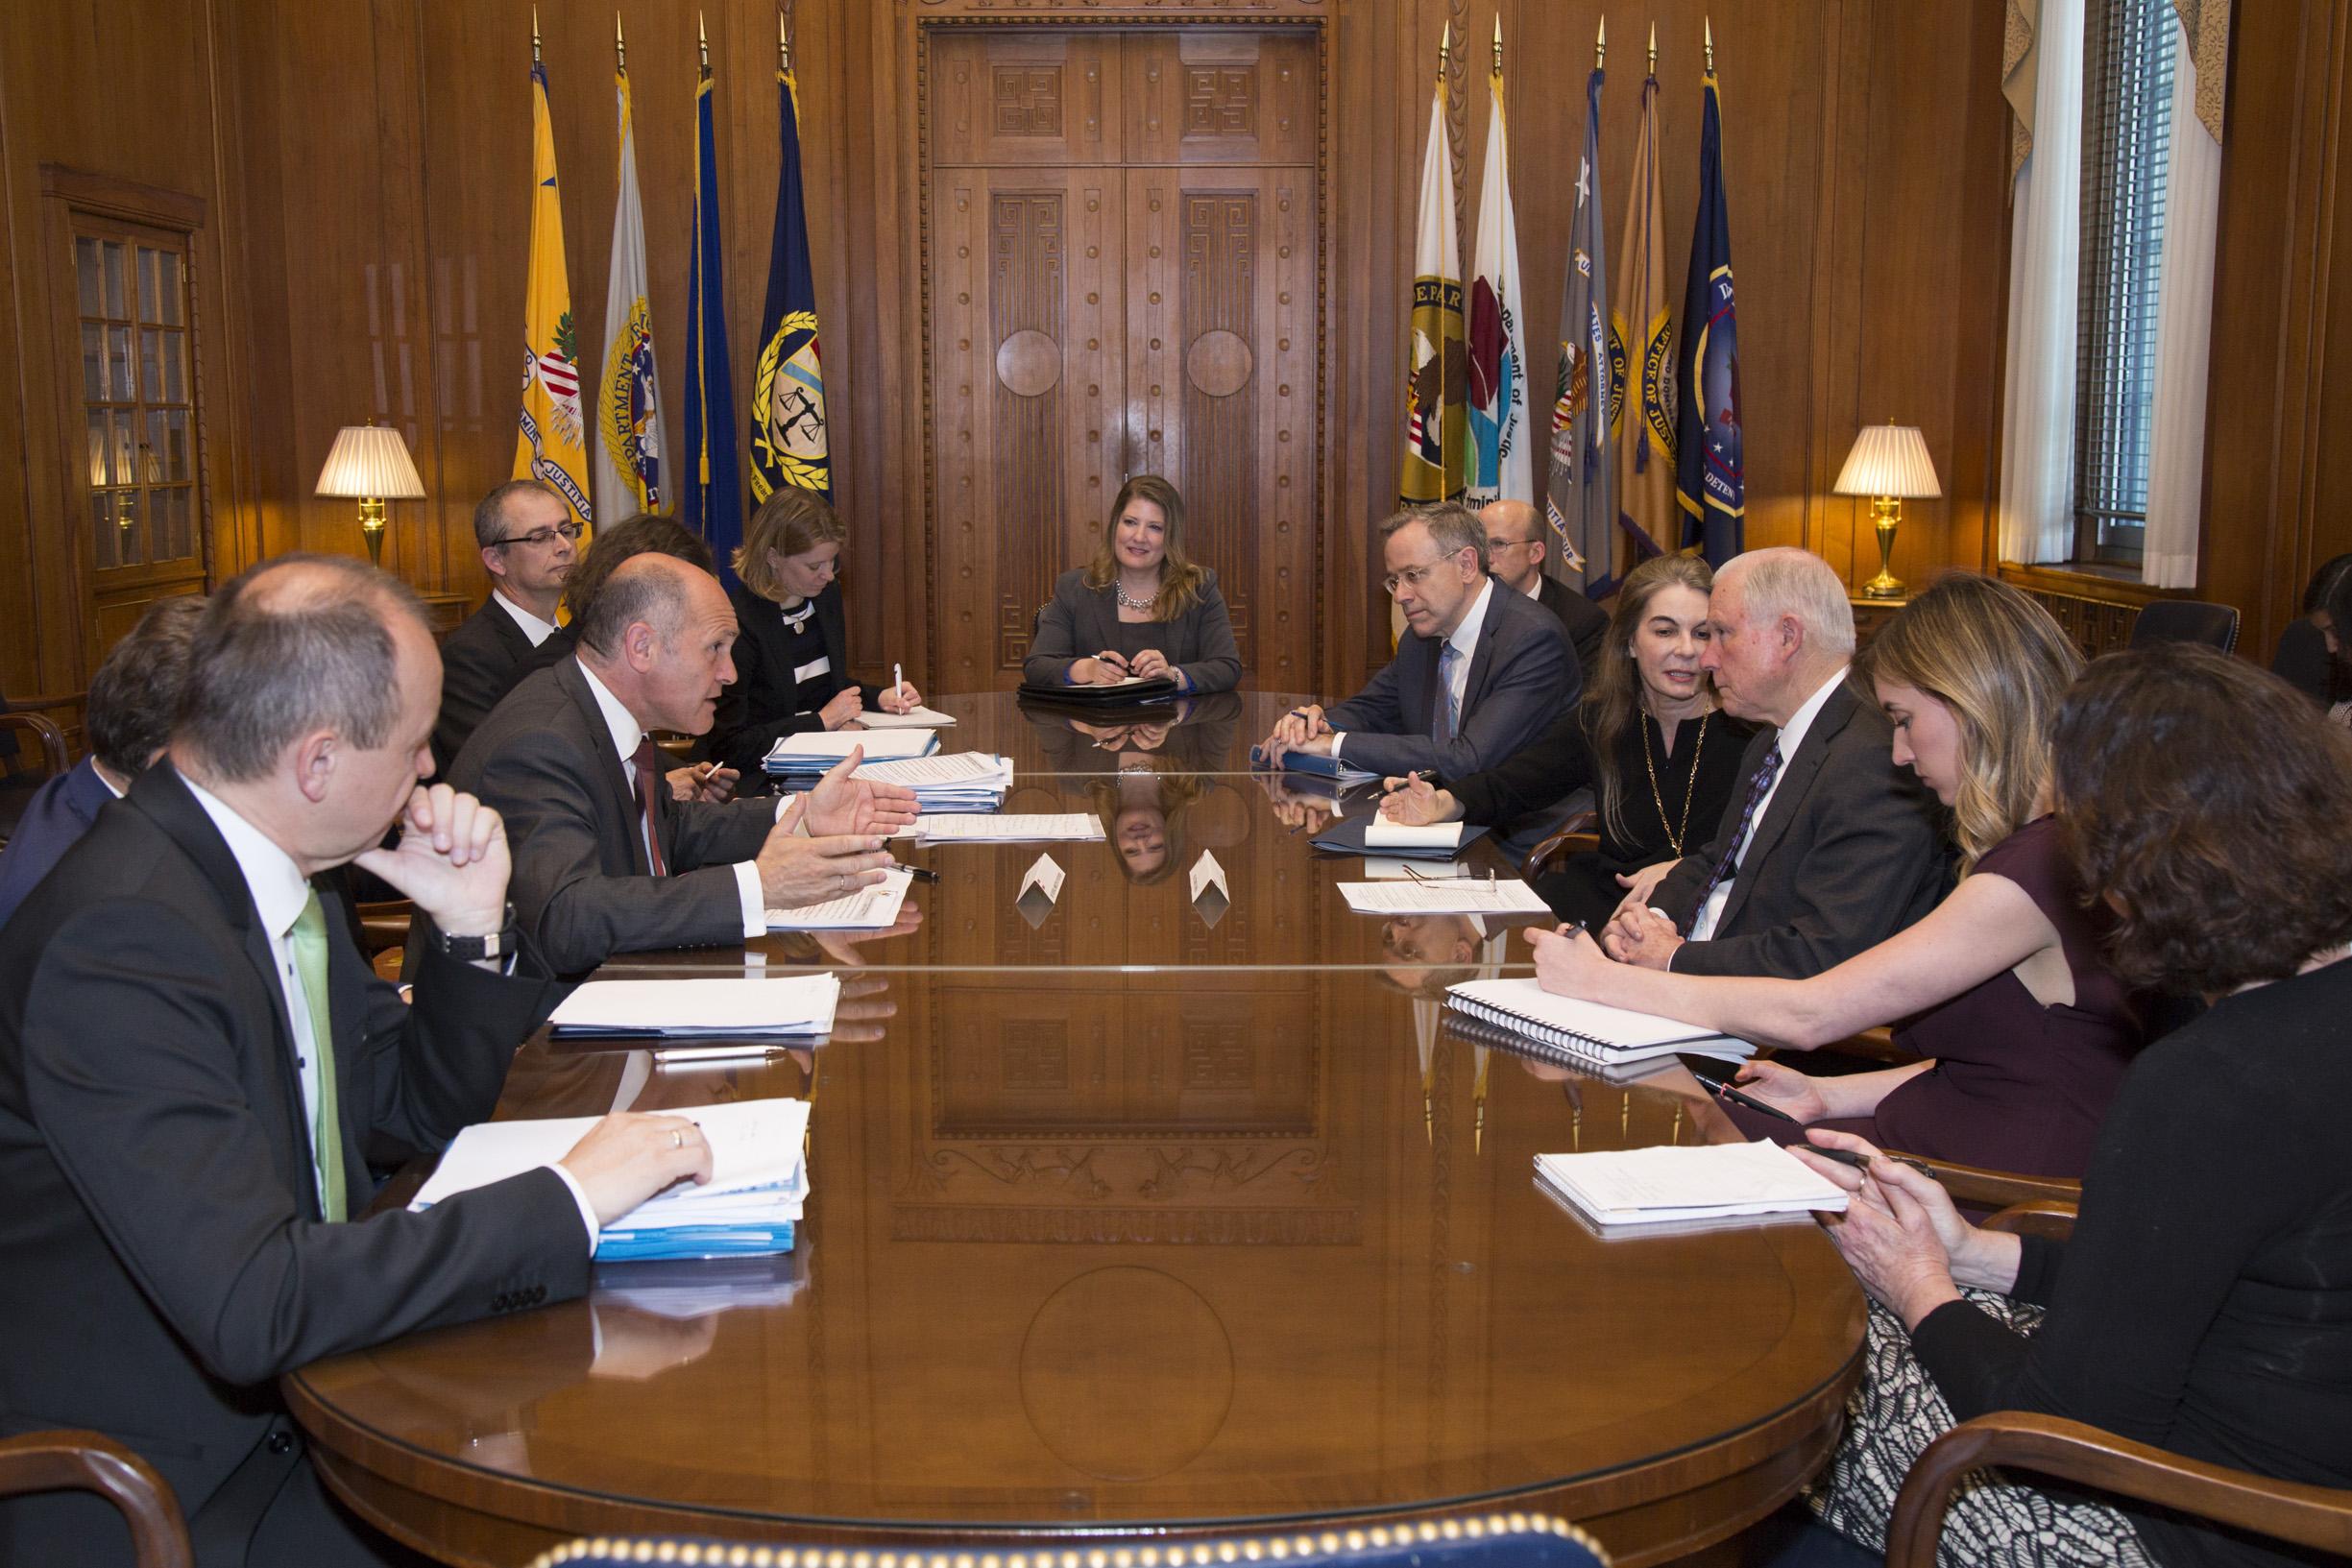 "Federal Minister Sobotka and delegation meet Attorney General Jeff Sessions.         96              Normal   0           false   false   false     EN-US   X-NONE   X-NONE                                                                                                                                                                                                                                                                                                                                                                                                                                                                                                                                                                                                                                                                                                                                                                                                                                                                                     /* Style Definitions */ table.MsoNormalTable {mso-style-name:""Table Normal""; mso-tstyle-rowband-size:0; mso-tstyle-colband-size:0; mso-style-noshow:yes; mso-style-priority:99; mso-style-parent:""""; mso-padding-alt:0in 5.4pt 0in 5.4pt; mso-para-margin:0in; mso-para-margin-bottom:.0001pt; mso-pagination:widow-orphan; font-size:12.0pt; font-family:Calibri; mso-ascii-font-family:Calibri; mso-ascii-theme-font:minor-latin; mso-hansi-font-family:Calibri; mso-hansi-theme-font:minor-latin;}      Photo: BMI/ Jürgen Makowecz"